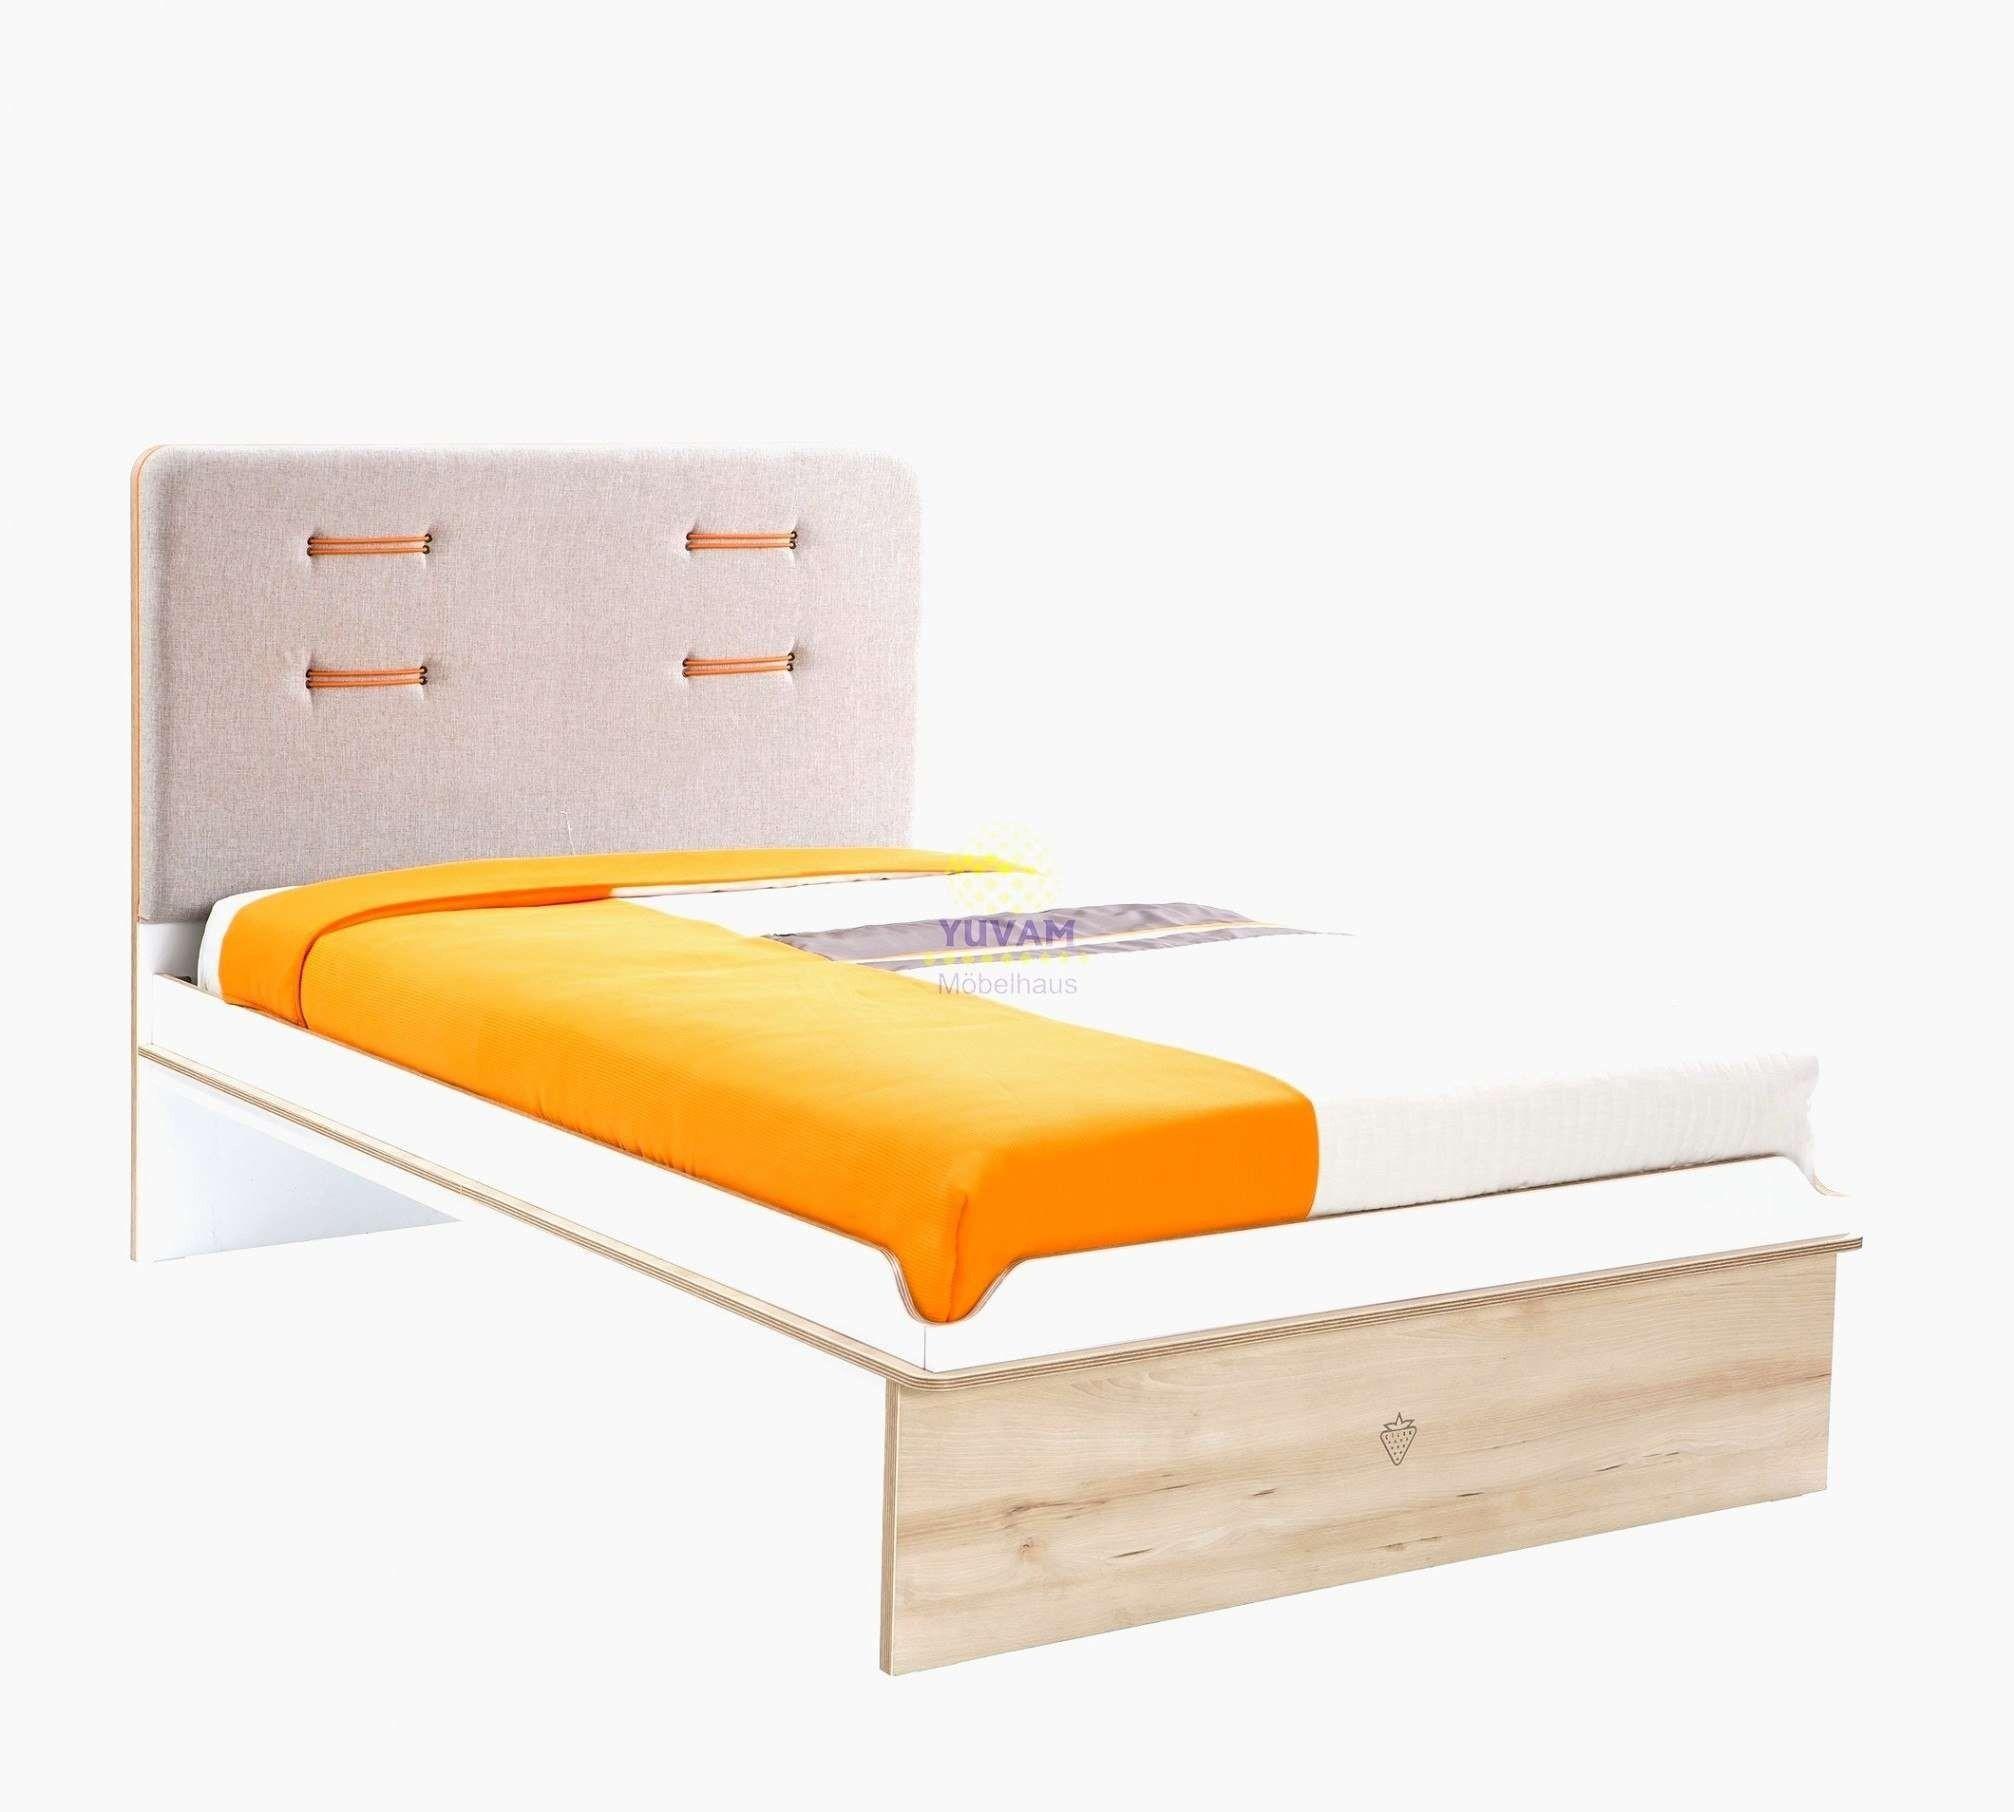 Bett 200 200 Mit Matratze Und Lattenrost Beautiful Bett 200 200 Mit Matratze Und Lattenrost Fur Bett Ohne